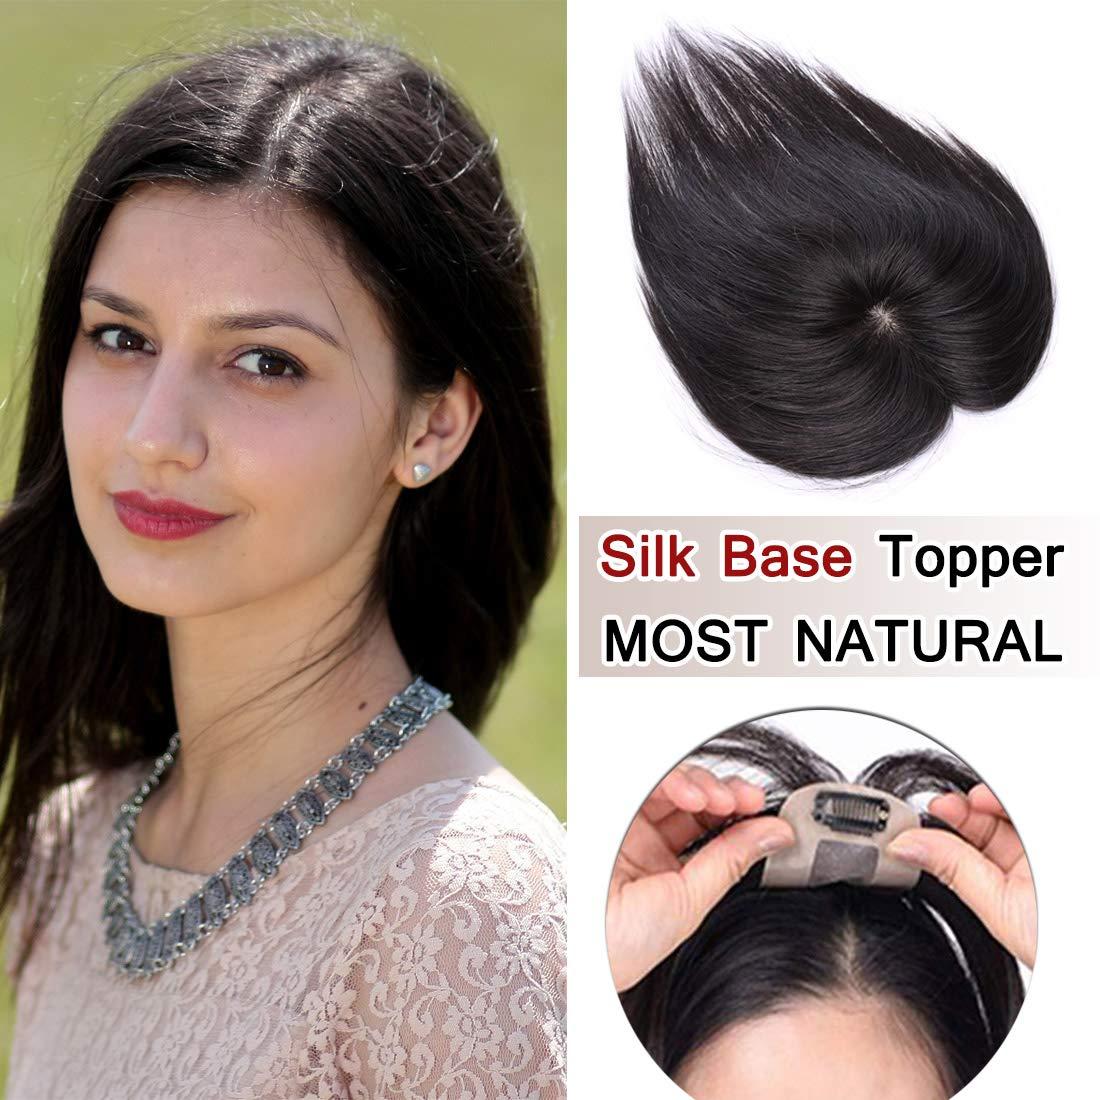 100% Density Top Hair Pieces Silk Base Crown Topper Human Hair Clip in Hair Toppers Top Hairpieces for Women with Thinning Hair Gray Hair/Hair Loss#1B Natural Black 14 inches 23g